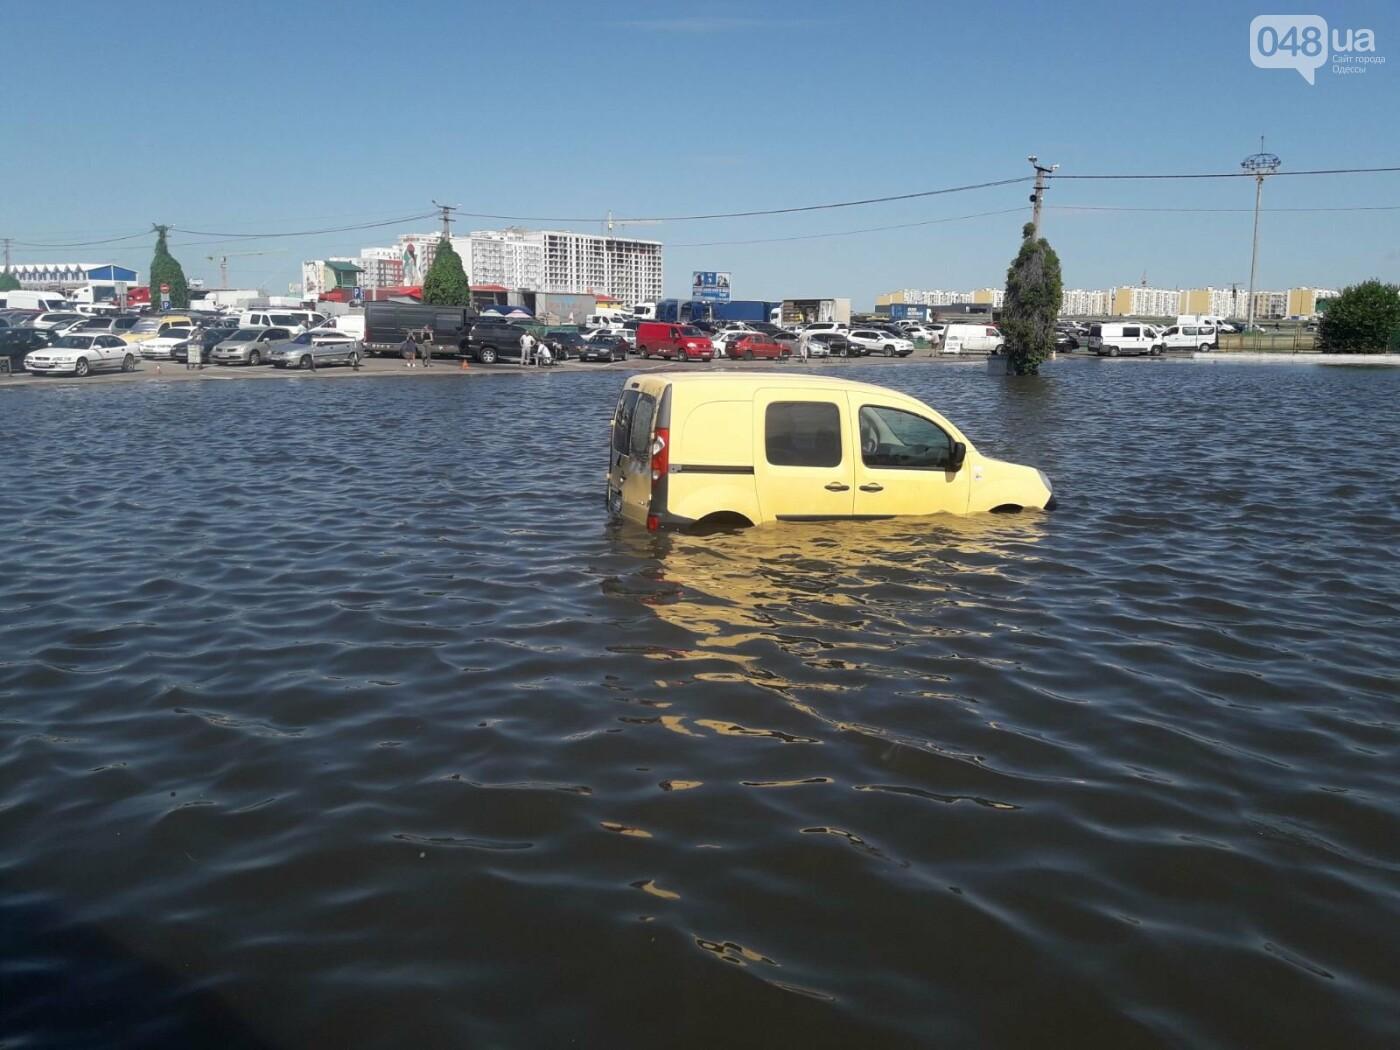 На промрынке 7км в Одессе образовалось море, - ФОТО, фото-12